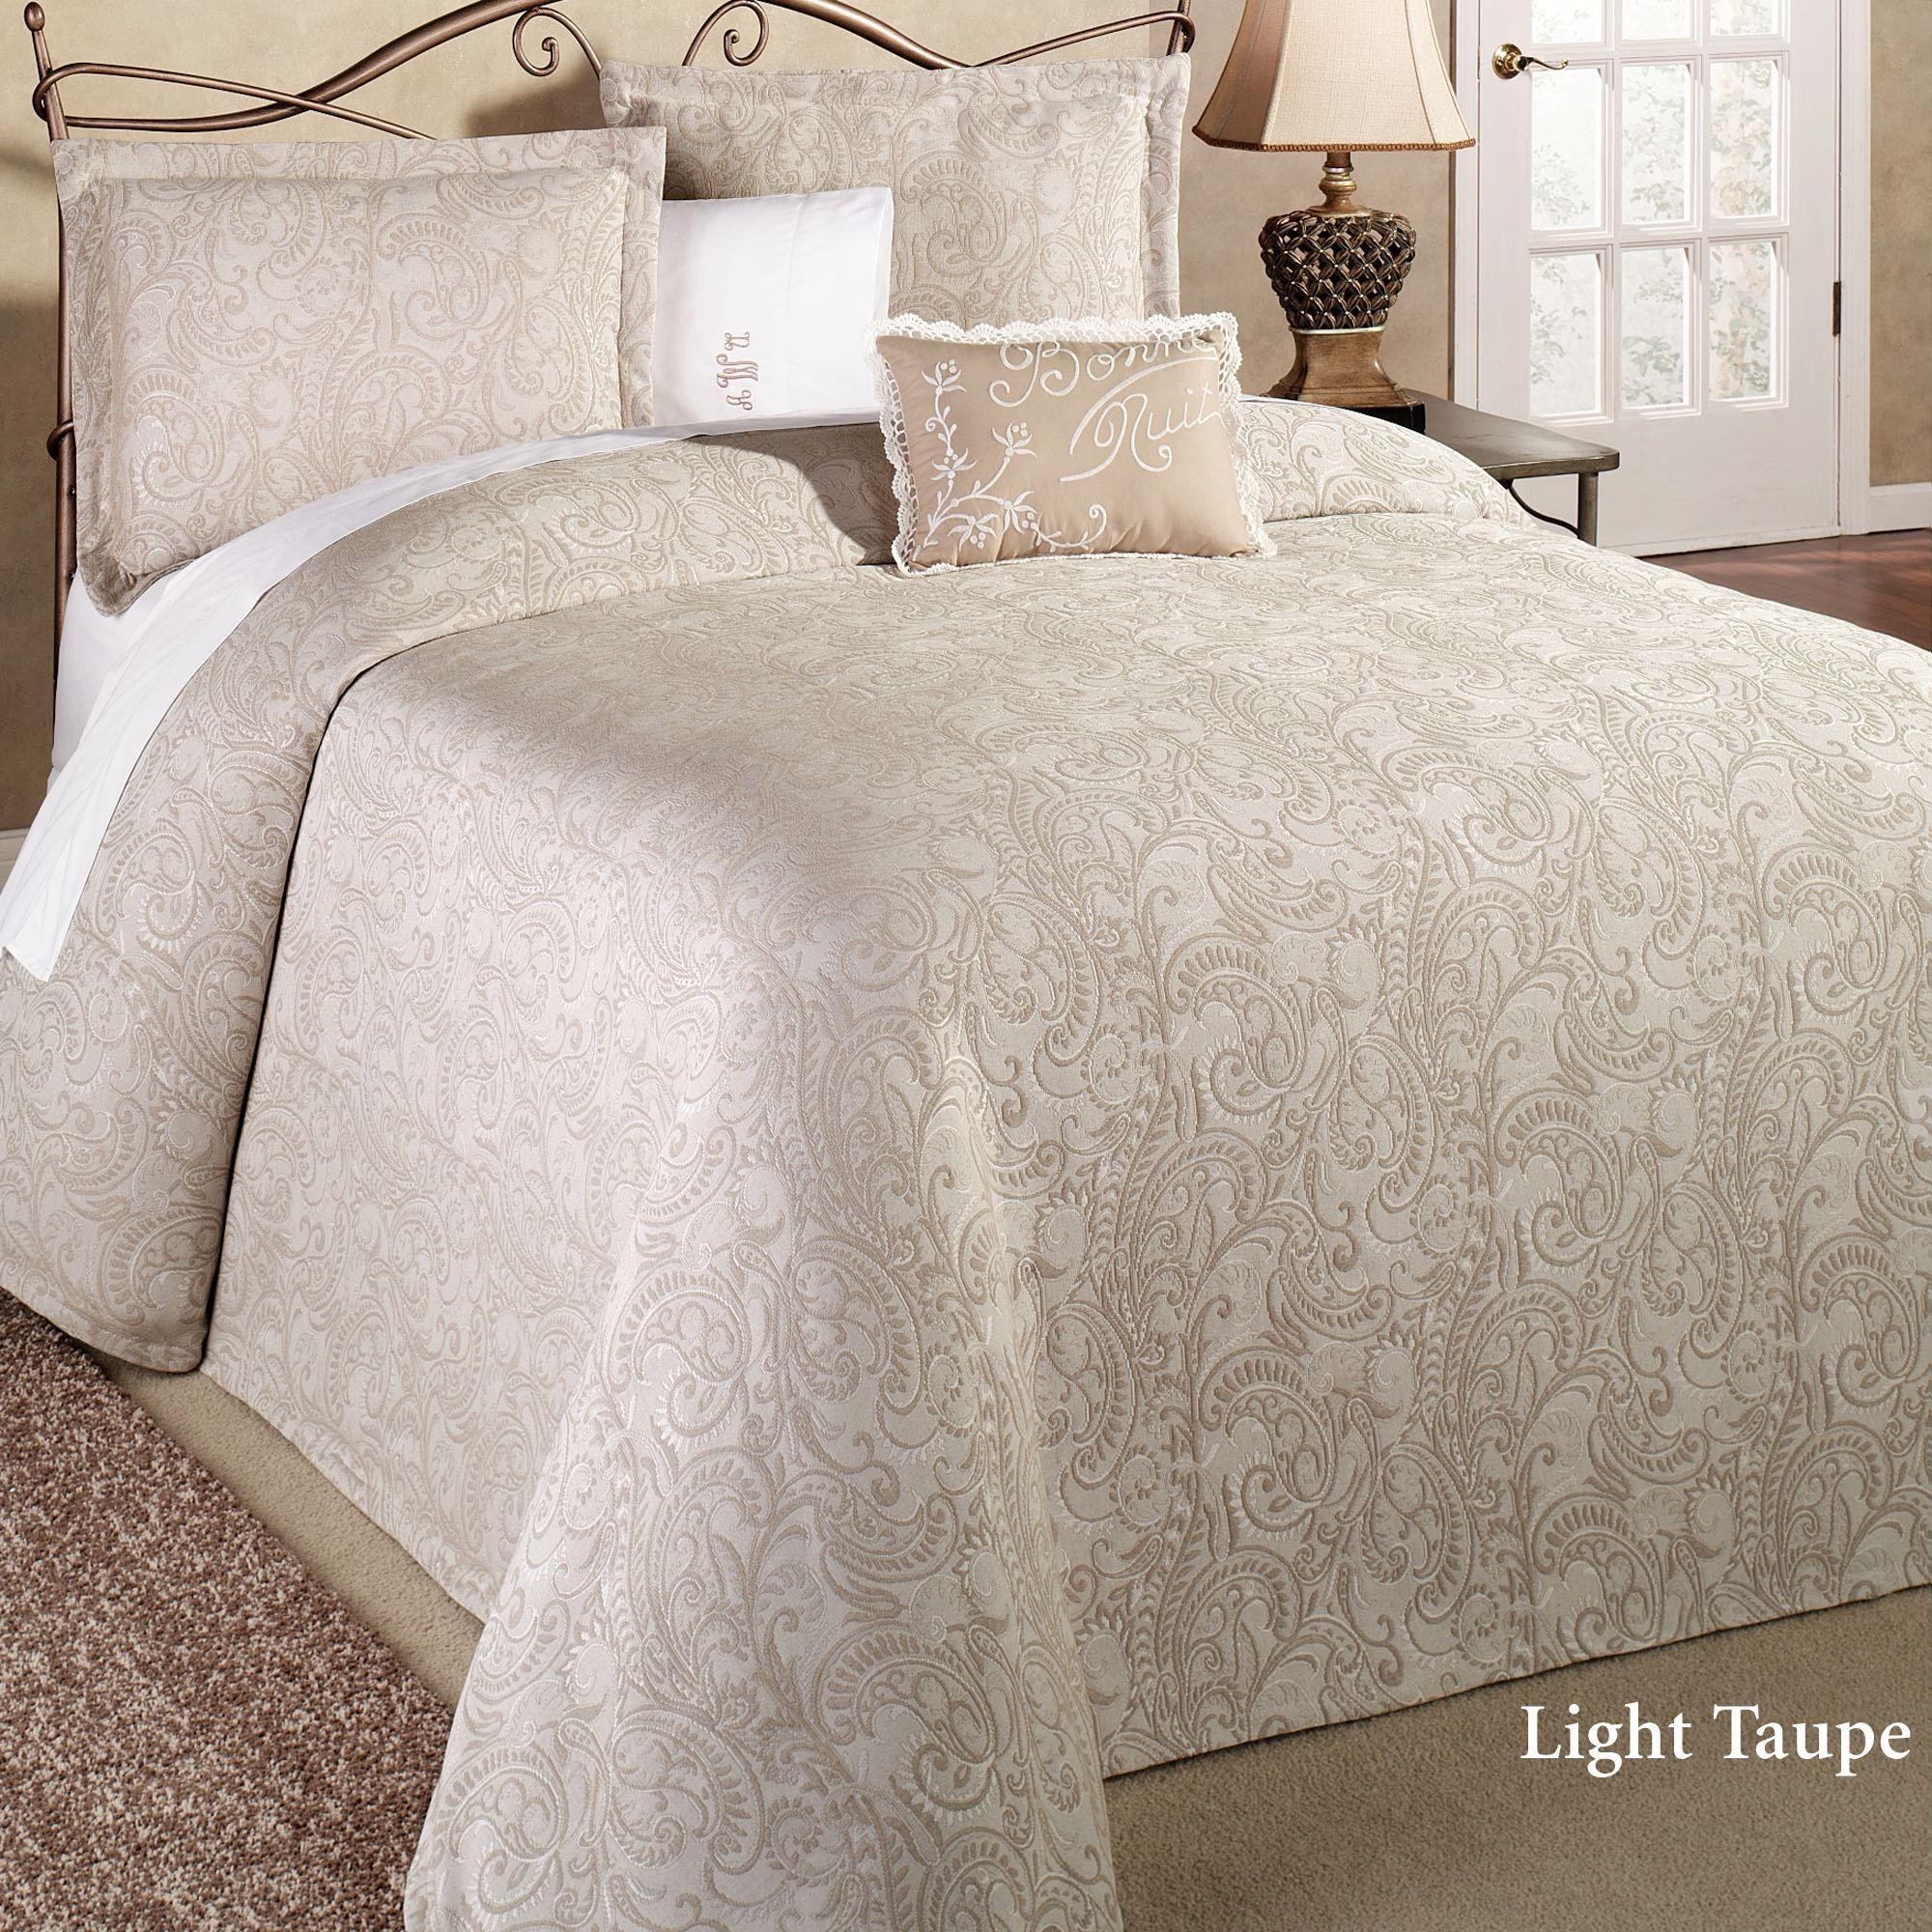 lightweight king bedspread bedding quilt touch of class provence matelasse bedspread lightweight bedding